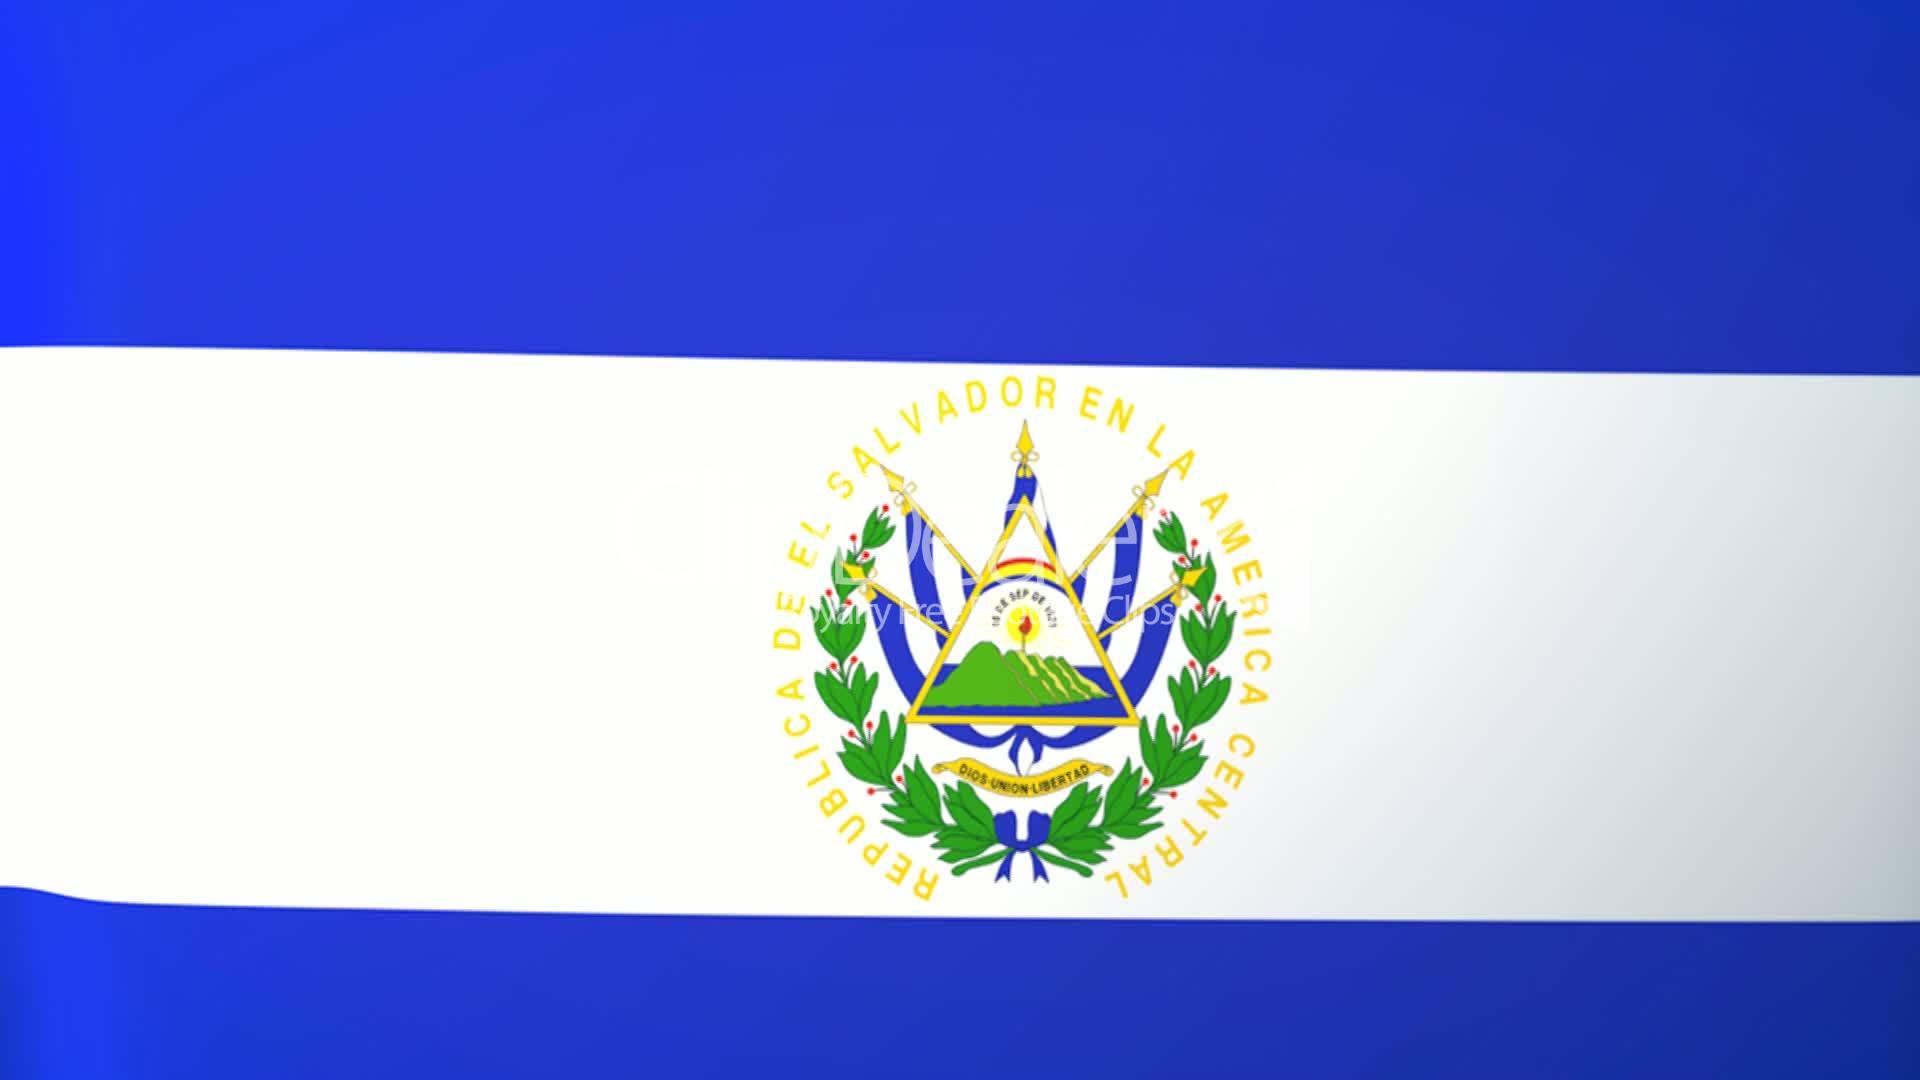 El Salvador Waving Flag: Royalty-free video and stock footage